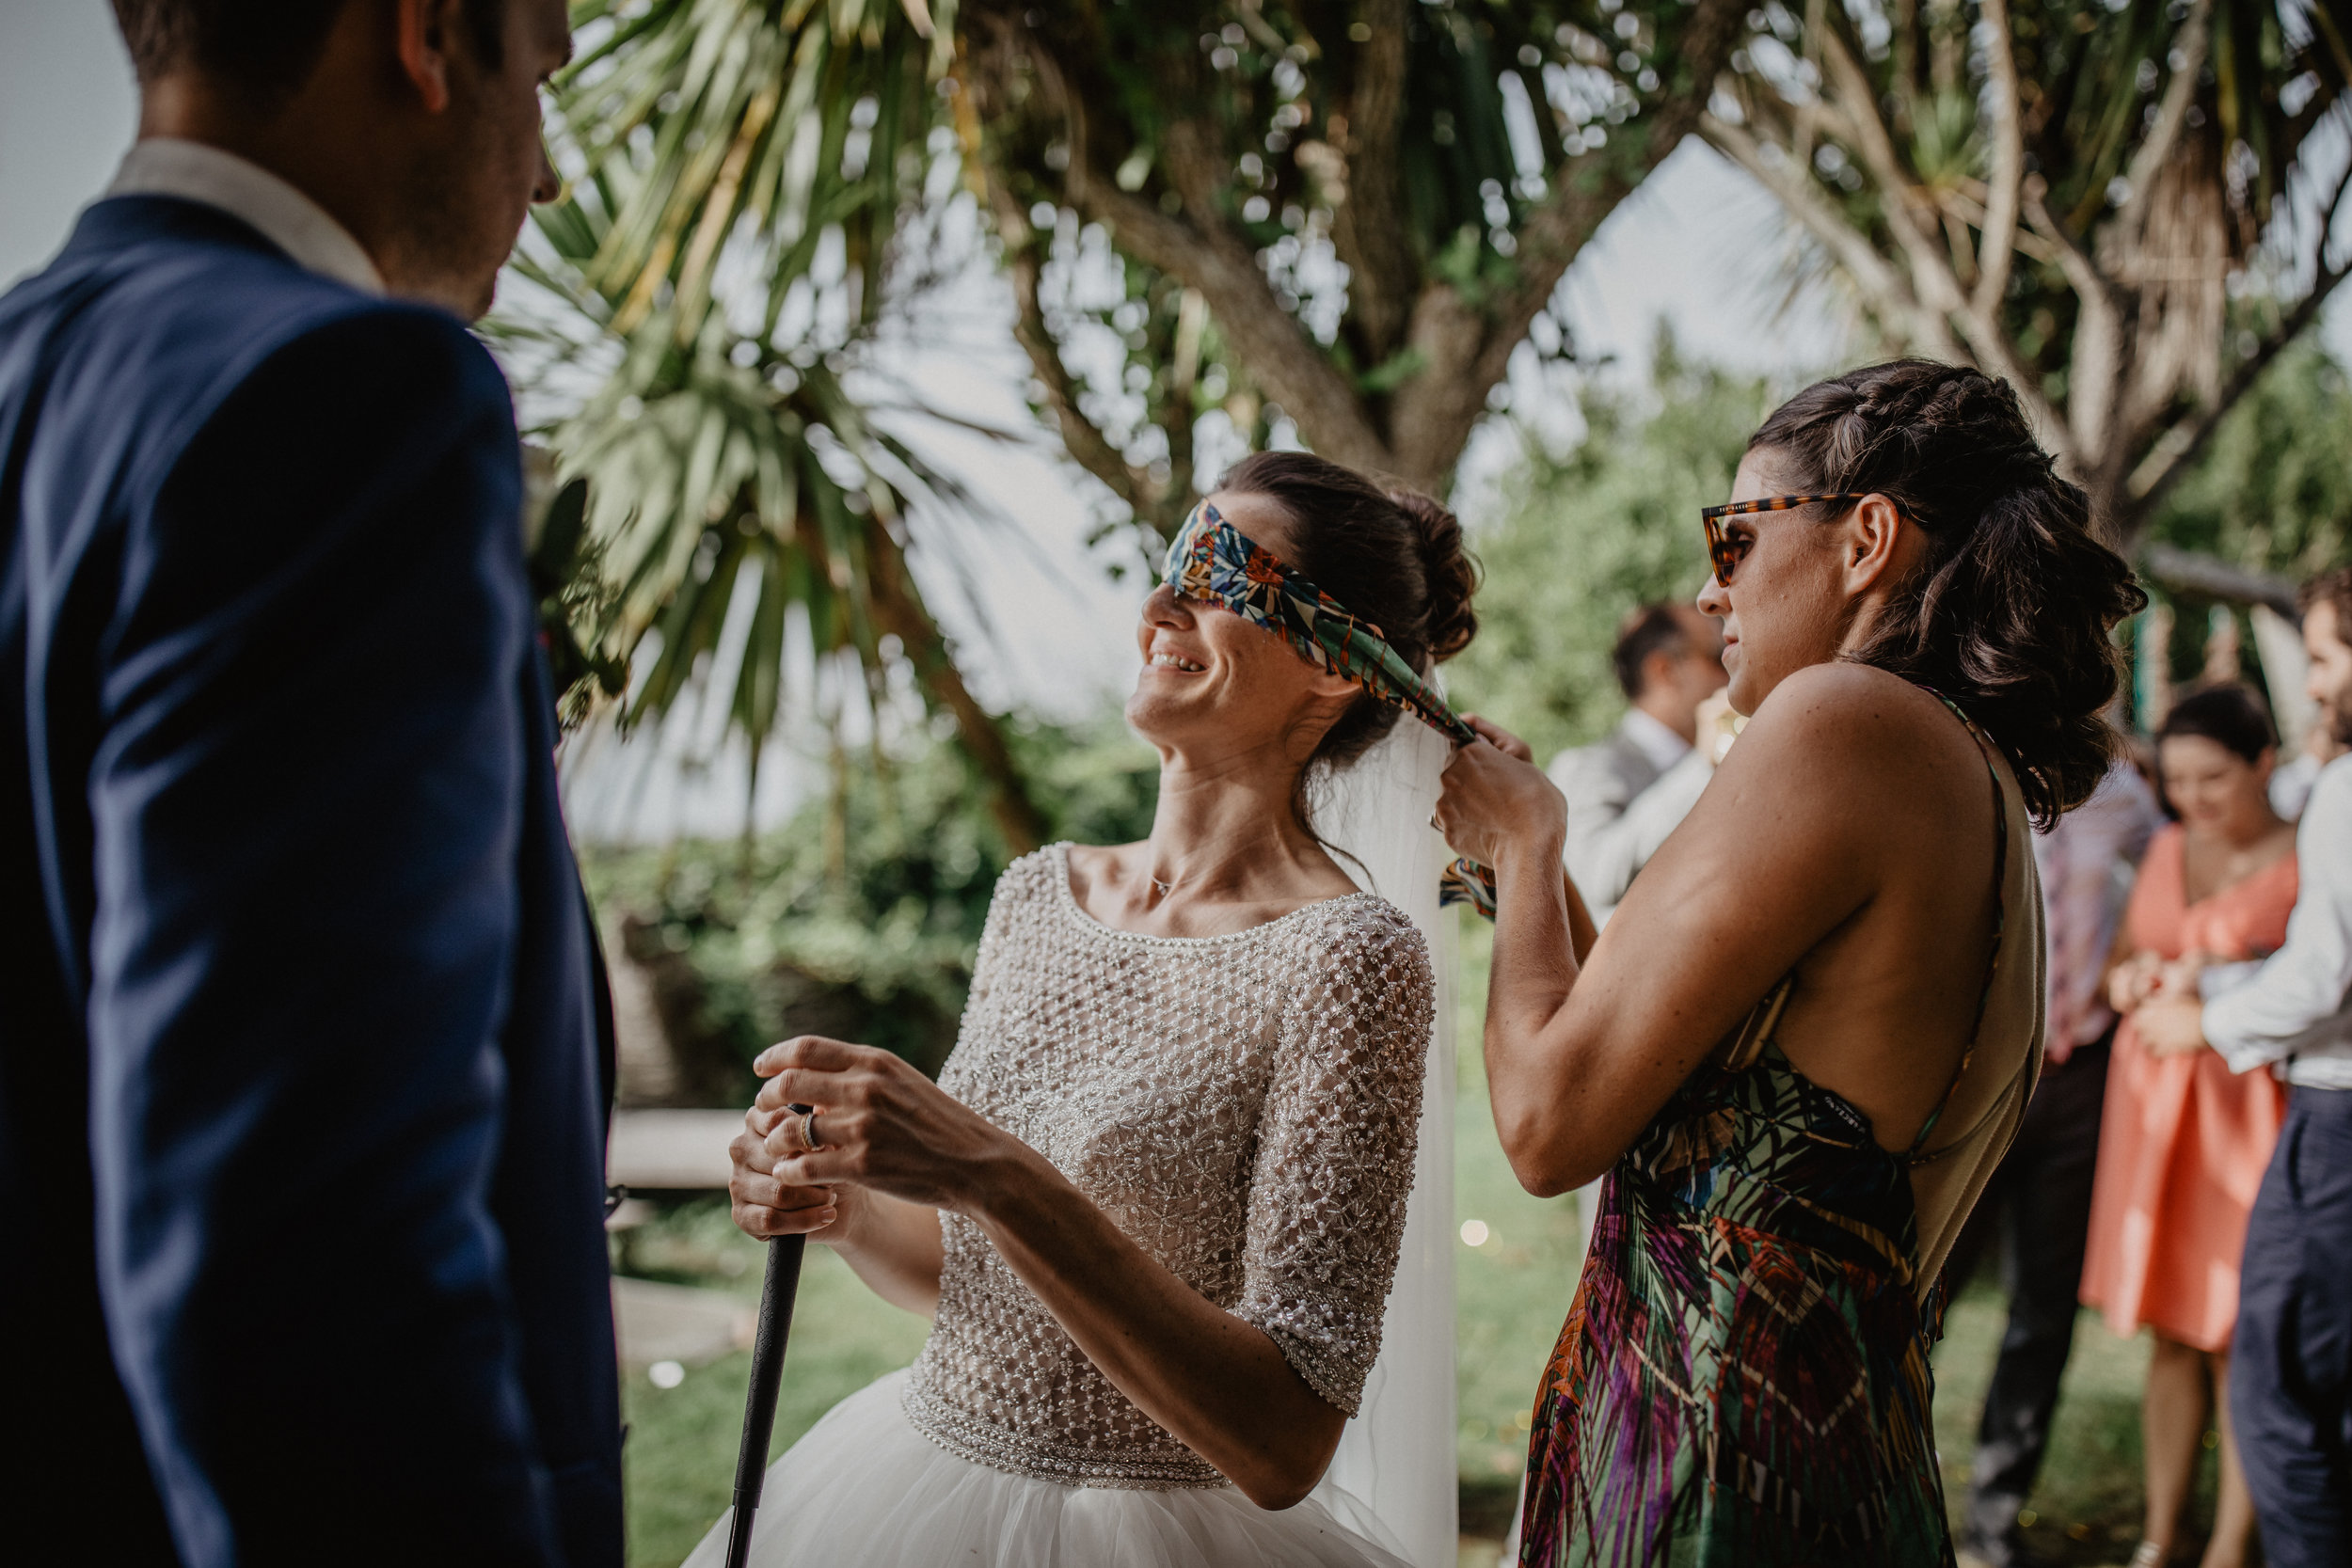 Lapela-photography-wedding-sintra-portugal-85.jpg